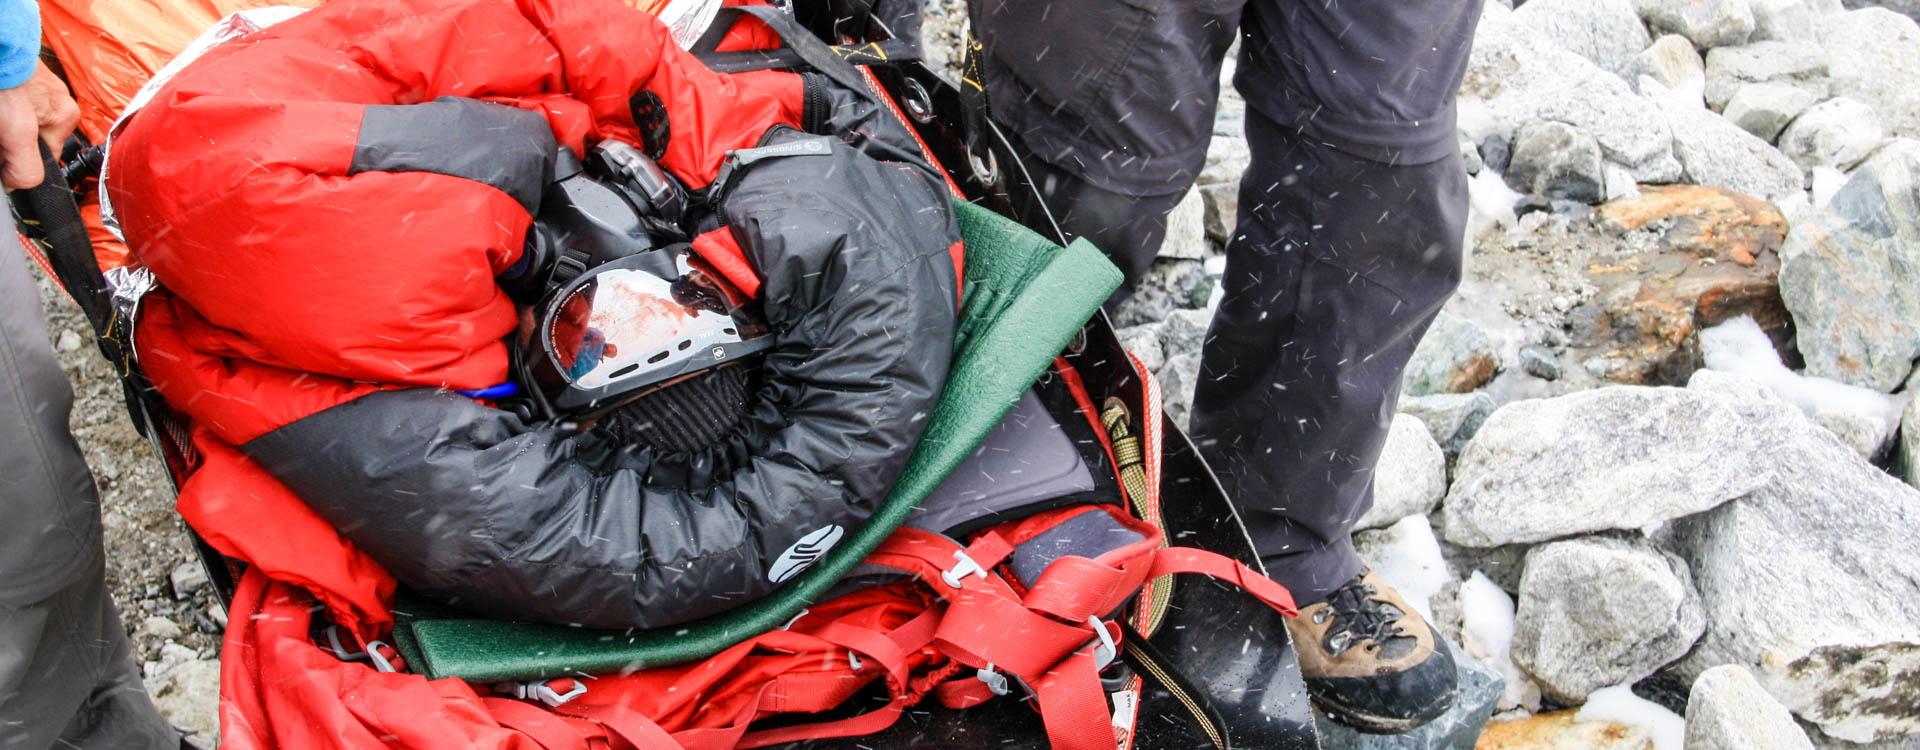 Expeditionsvorbereitung Höhenmedizin